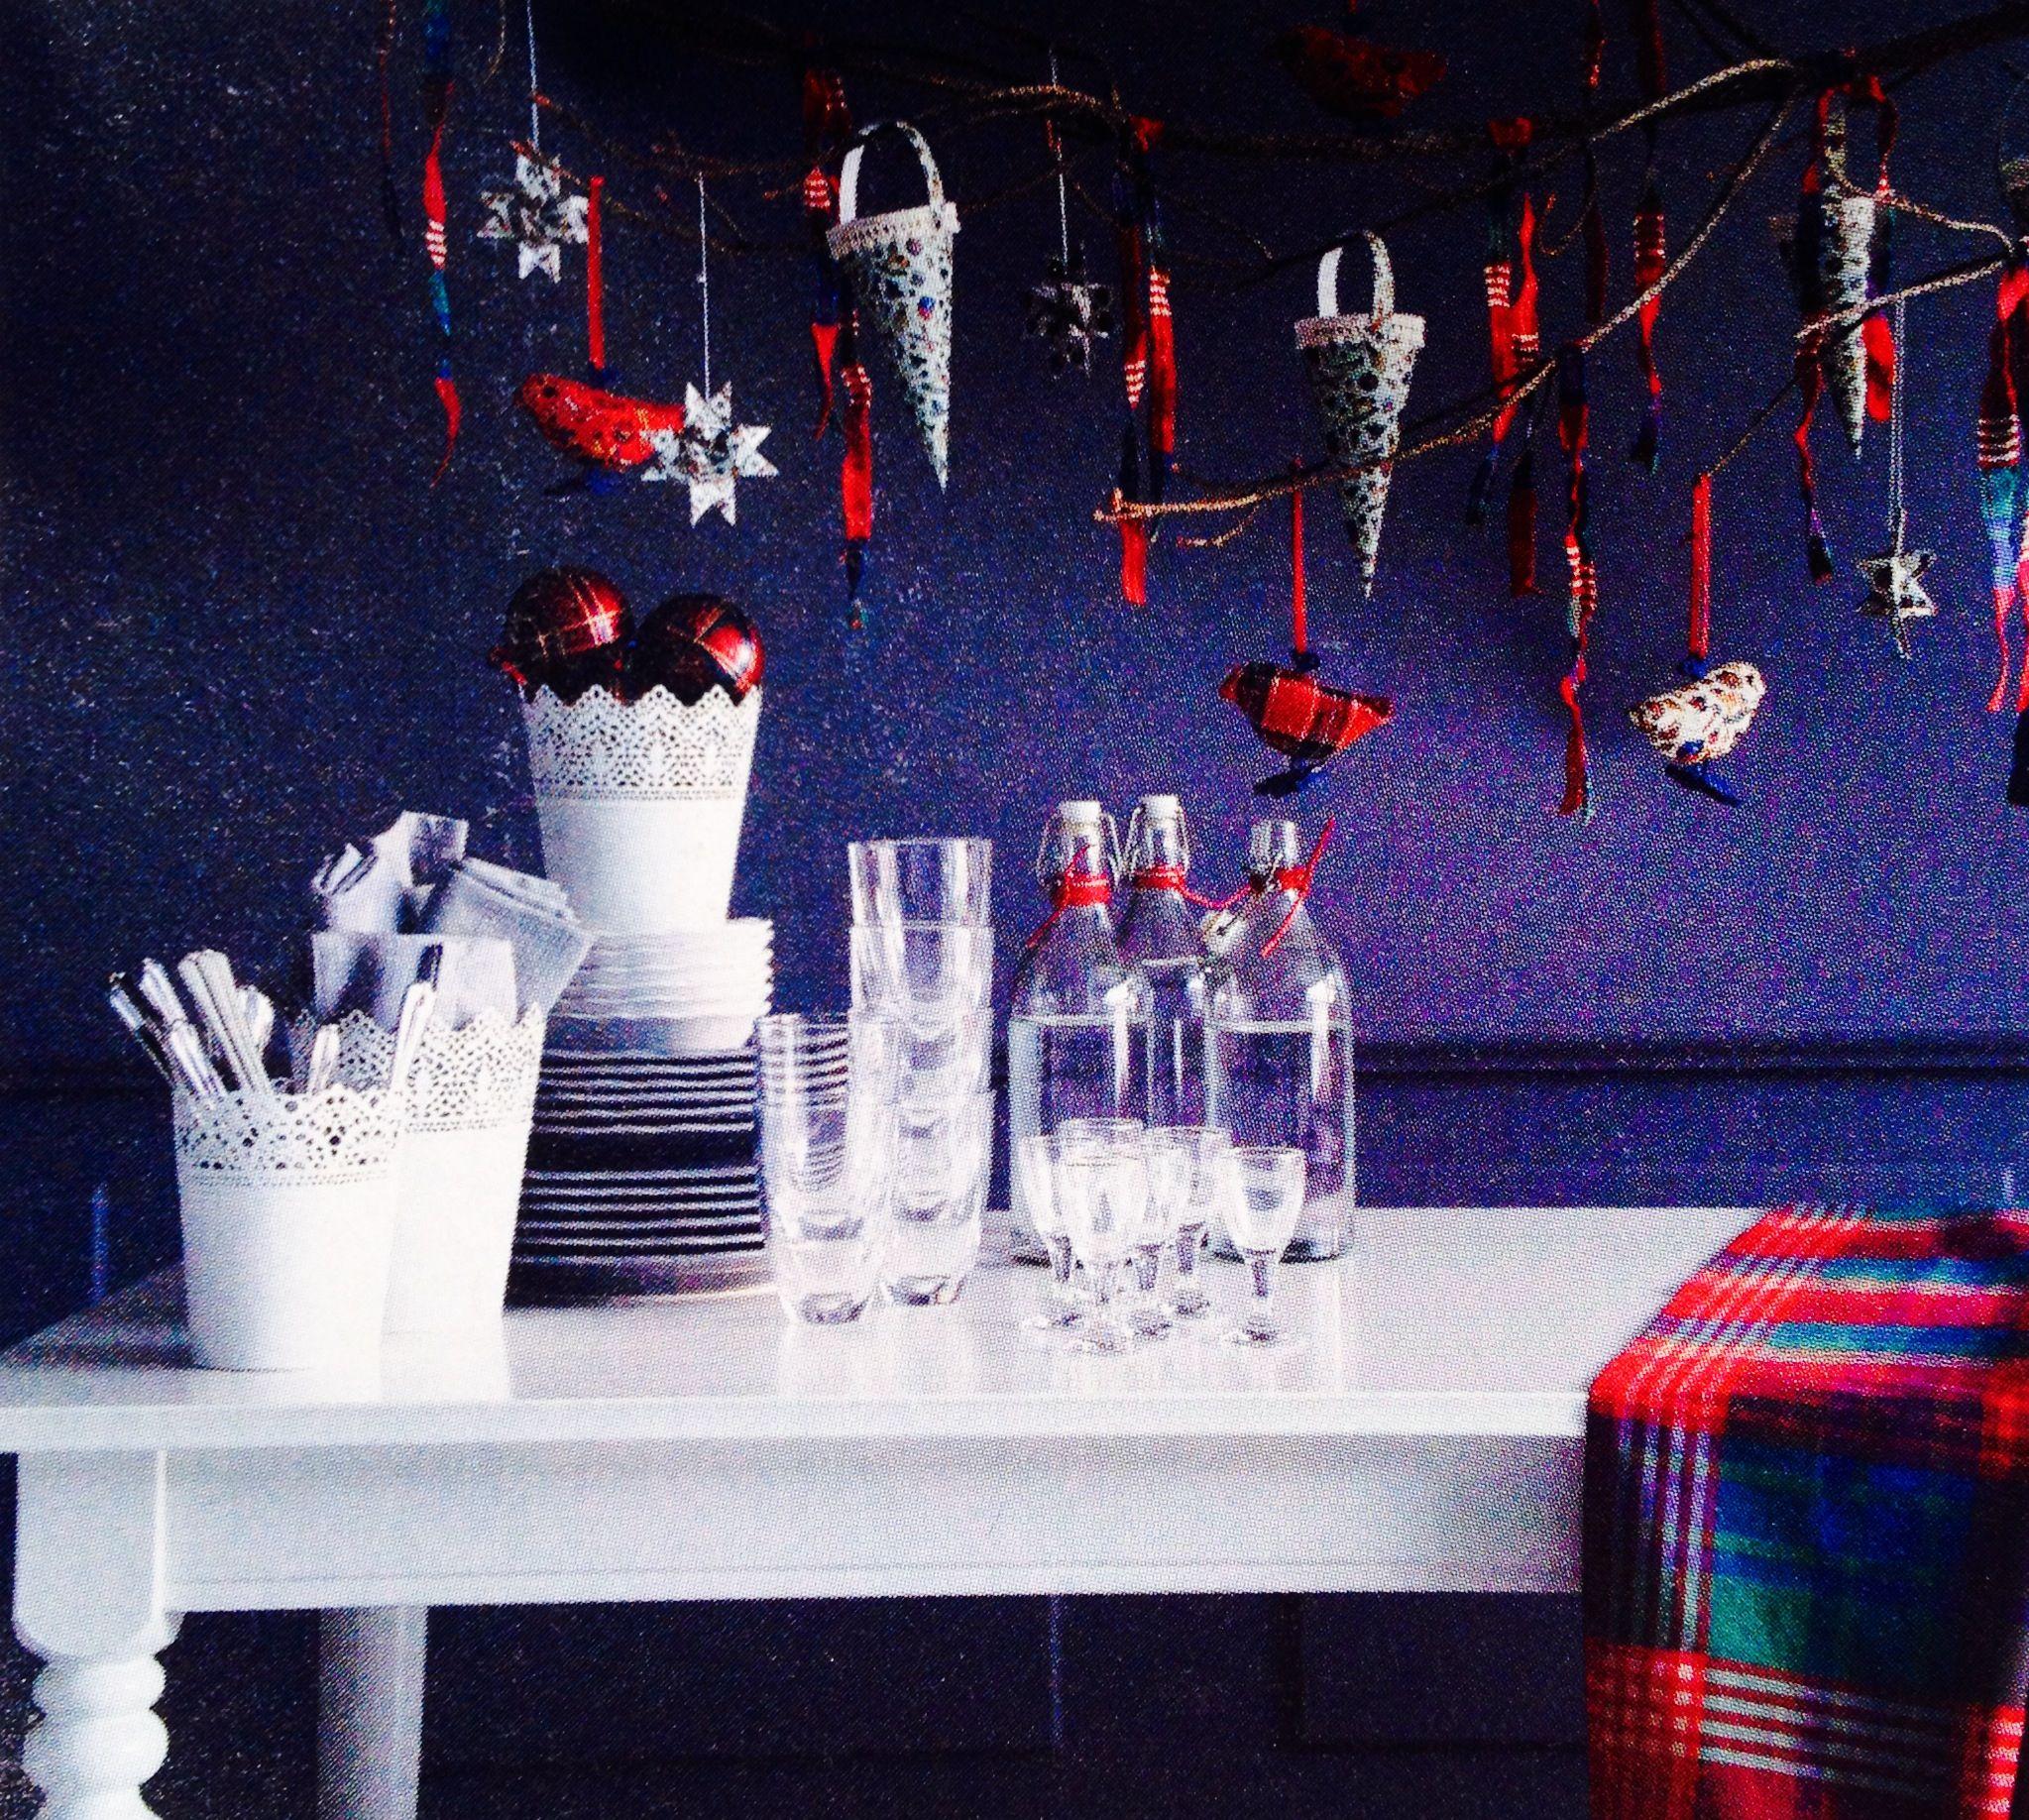 deco noel ikea god jul 2013 ikea christmas 2013 pinterest ikea christmas. Black Bedroom Furniture Sets. Home Design Ideas